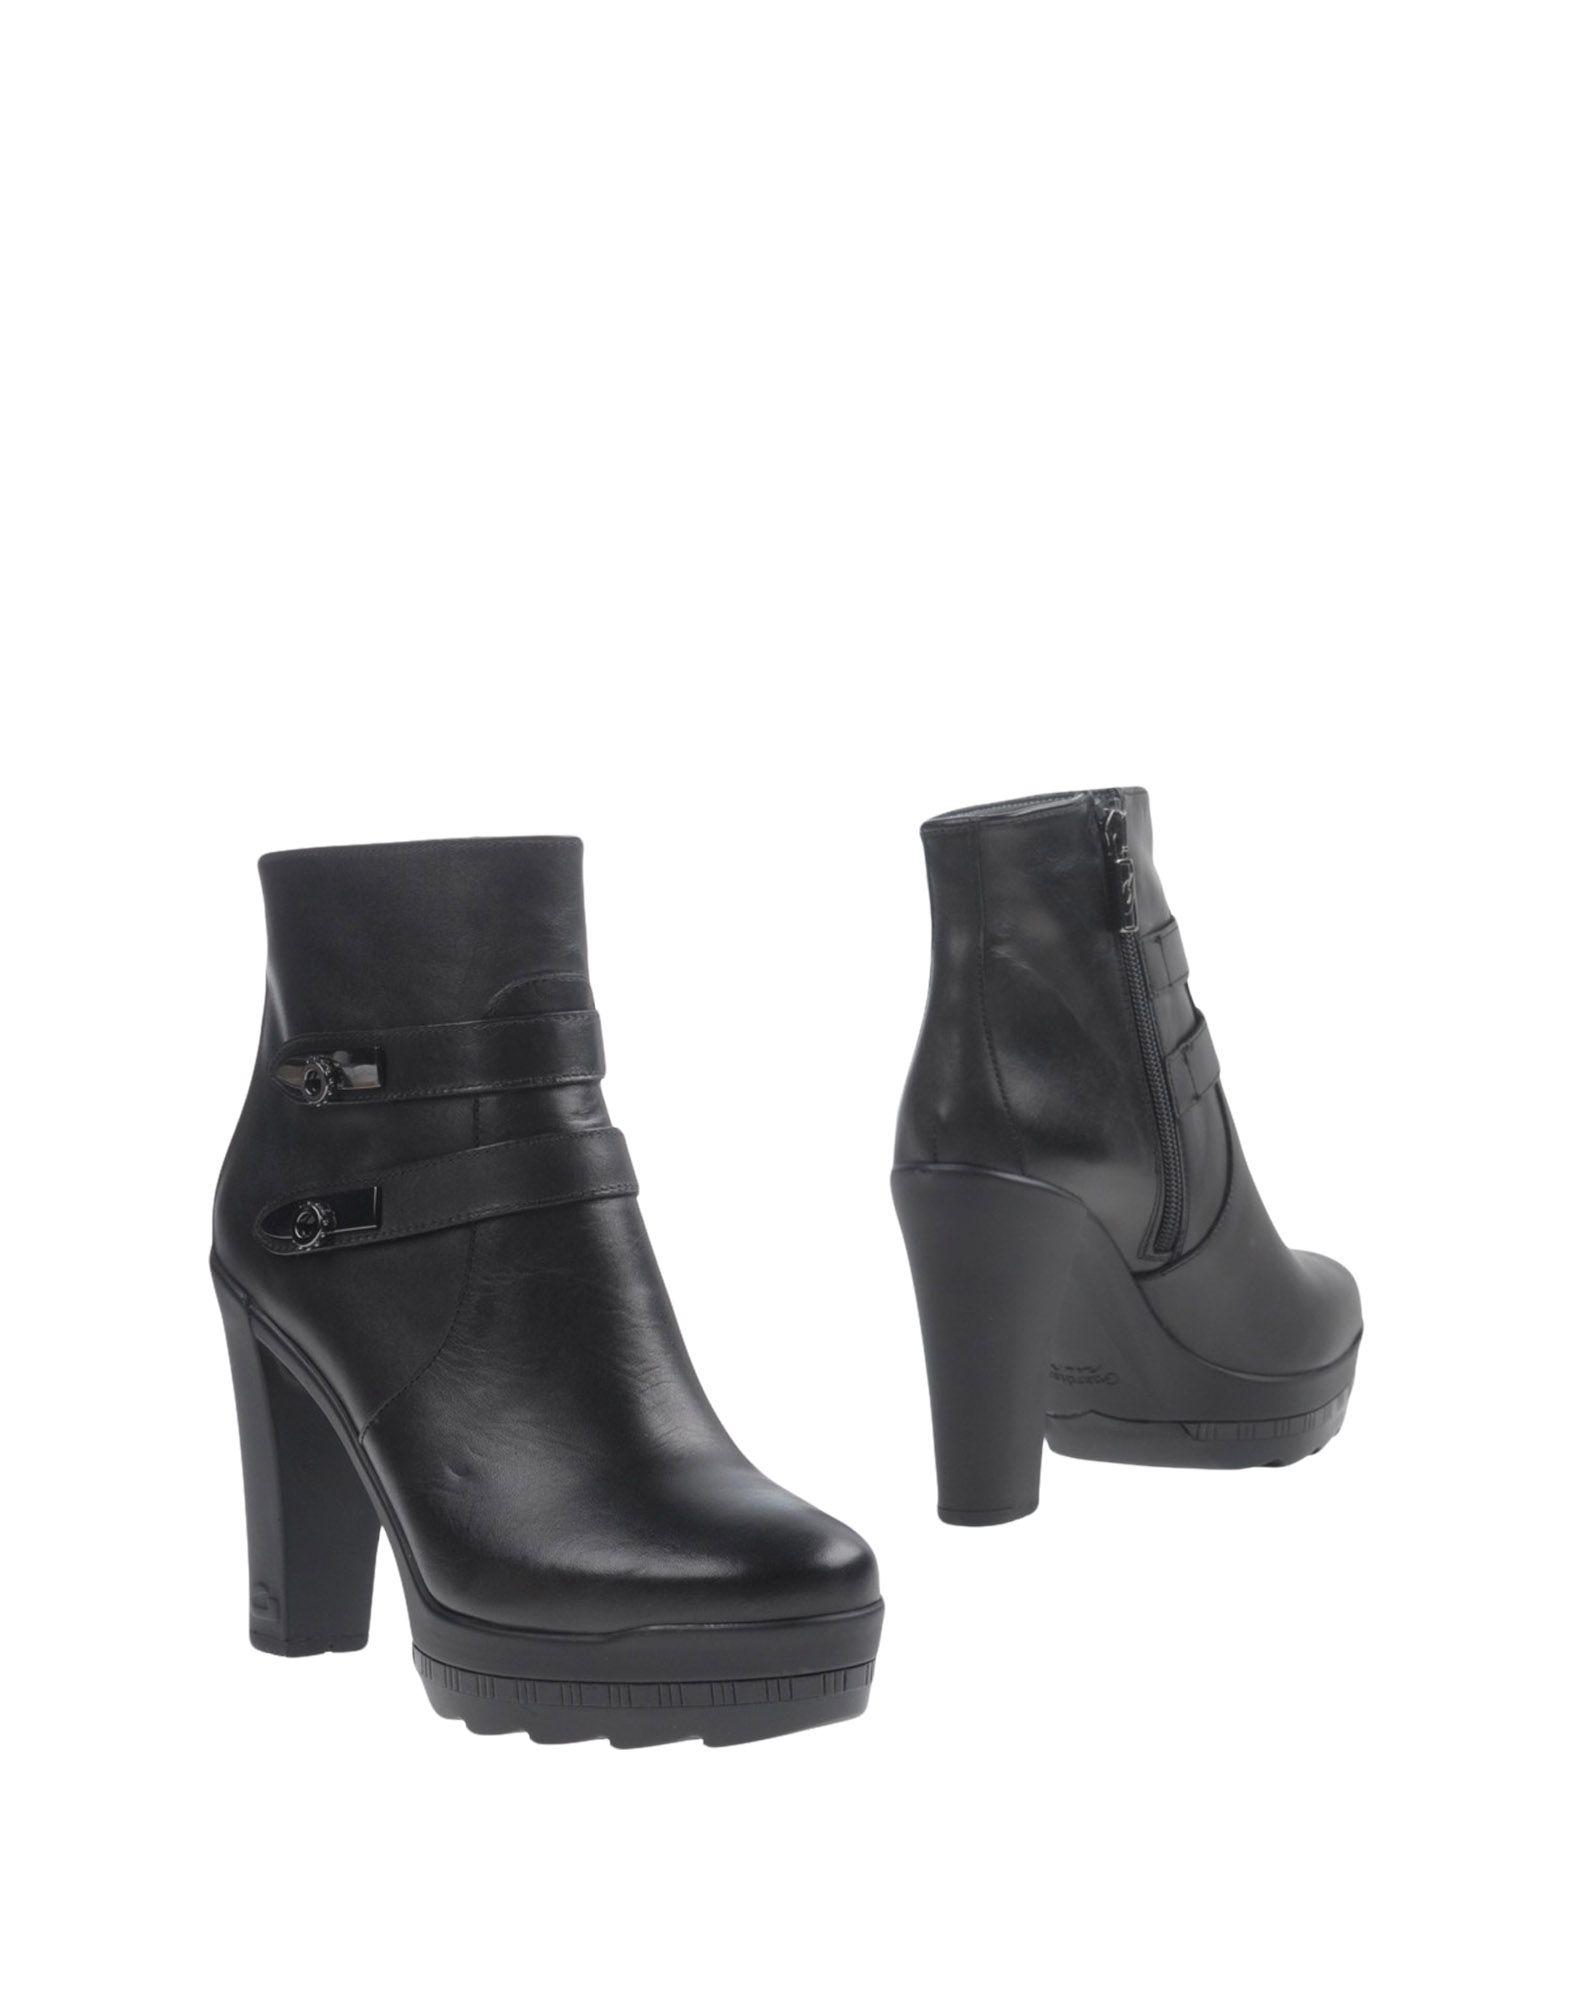 Gut Guardiani um billige Schuhe zu tragenAlberto Guardiani Gut Stiefelette Damen  11393182EX 0fd502